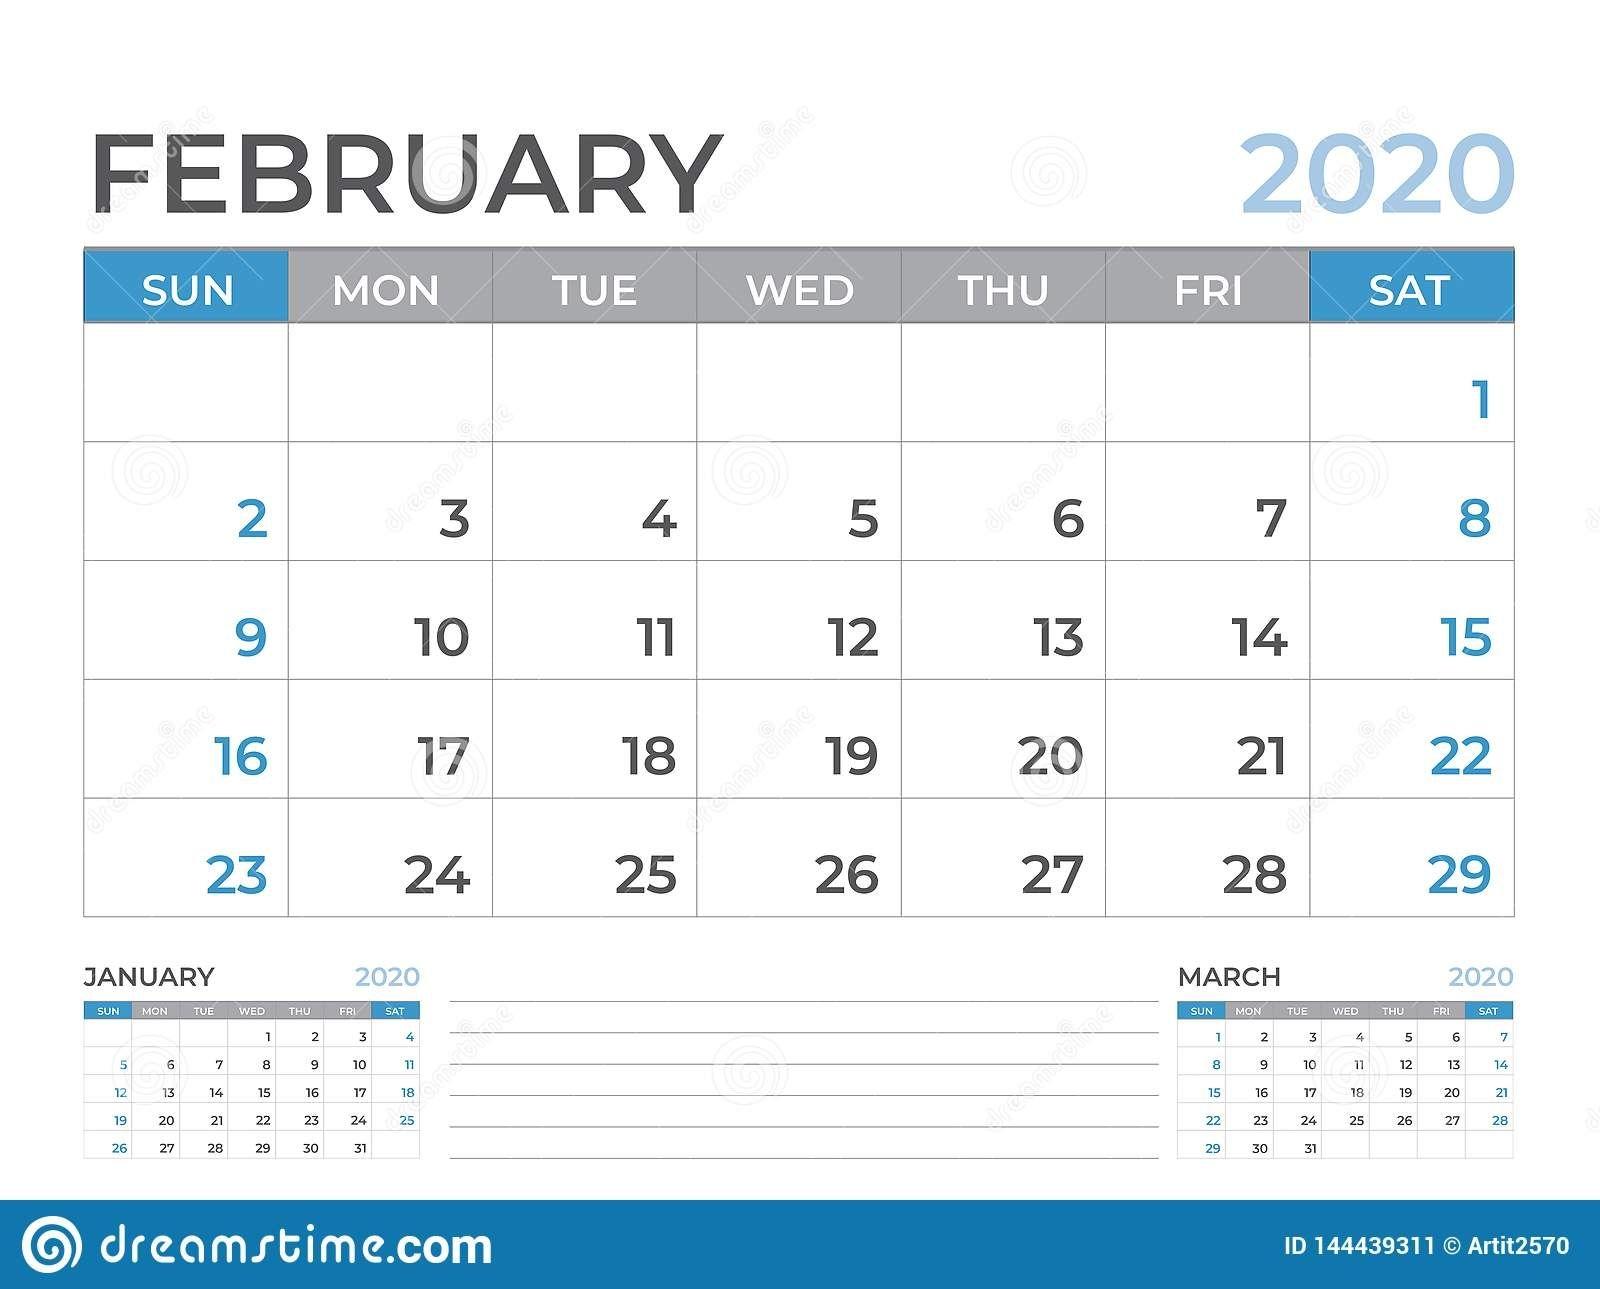 February 2020 Calendar Template, Desk Calendar Layout Size 8